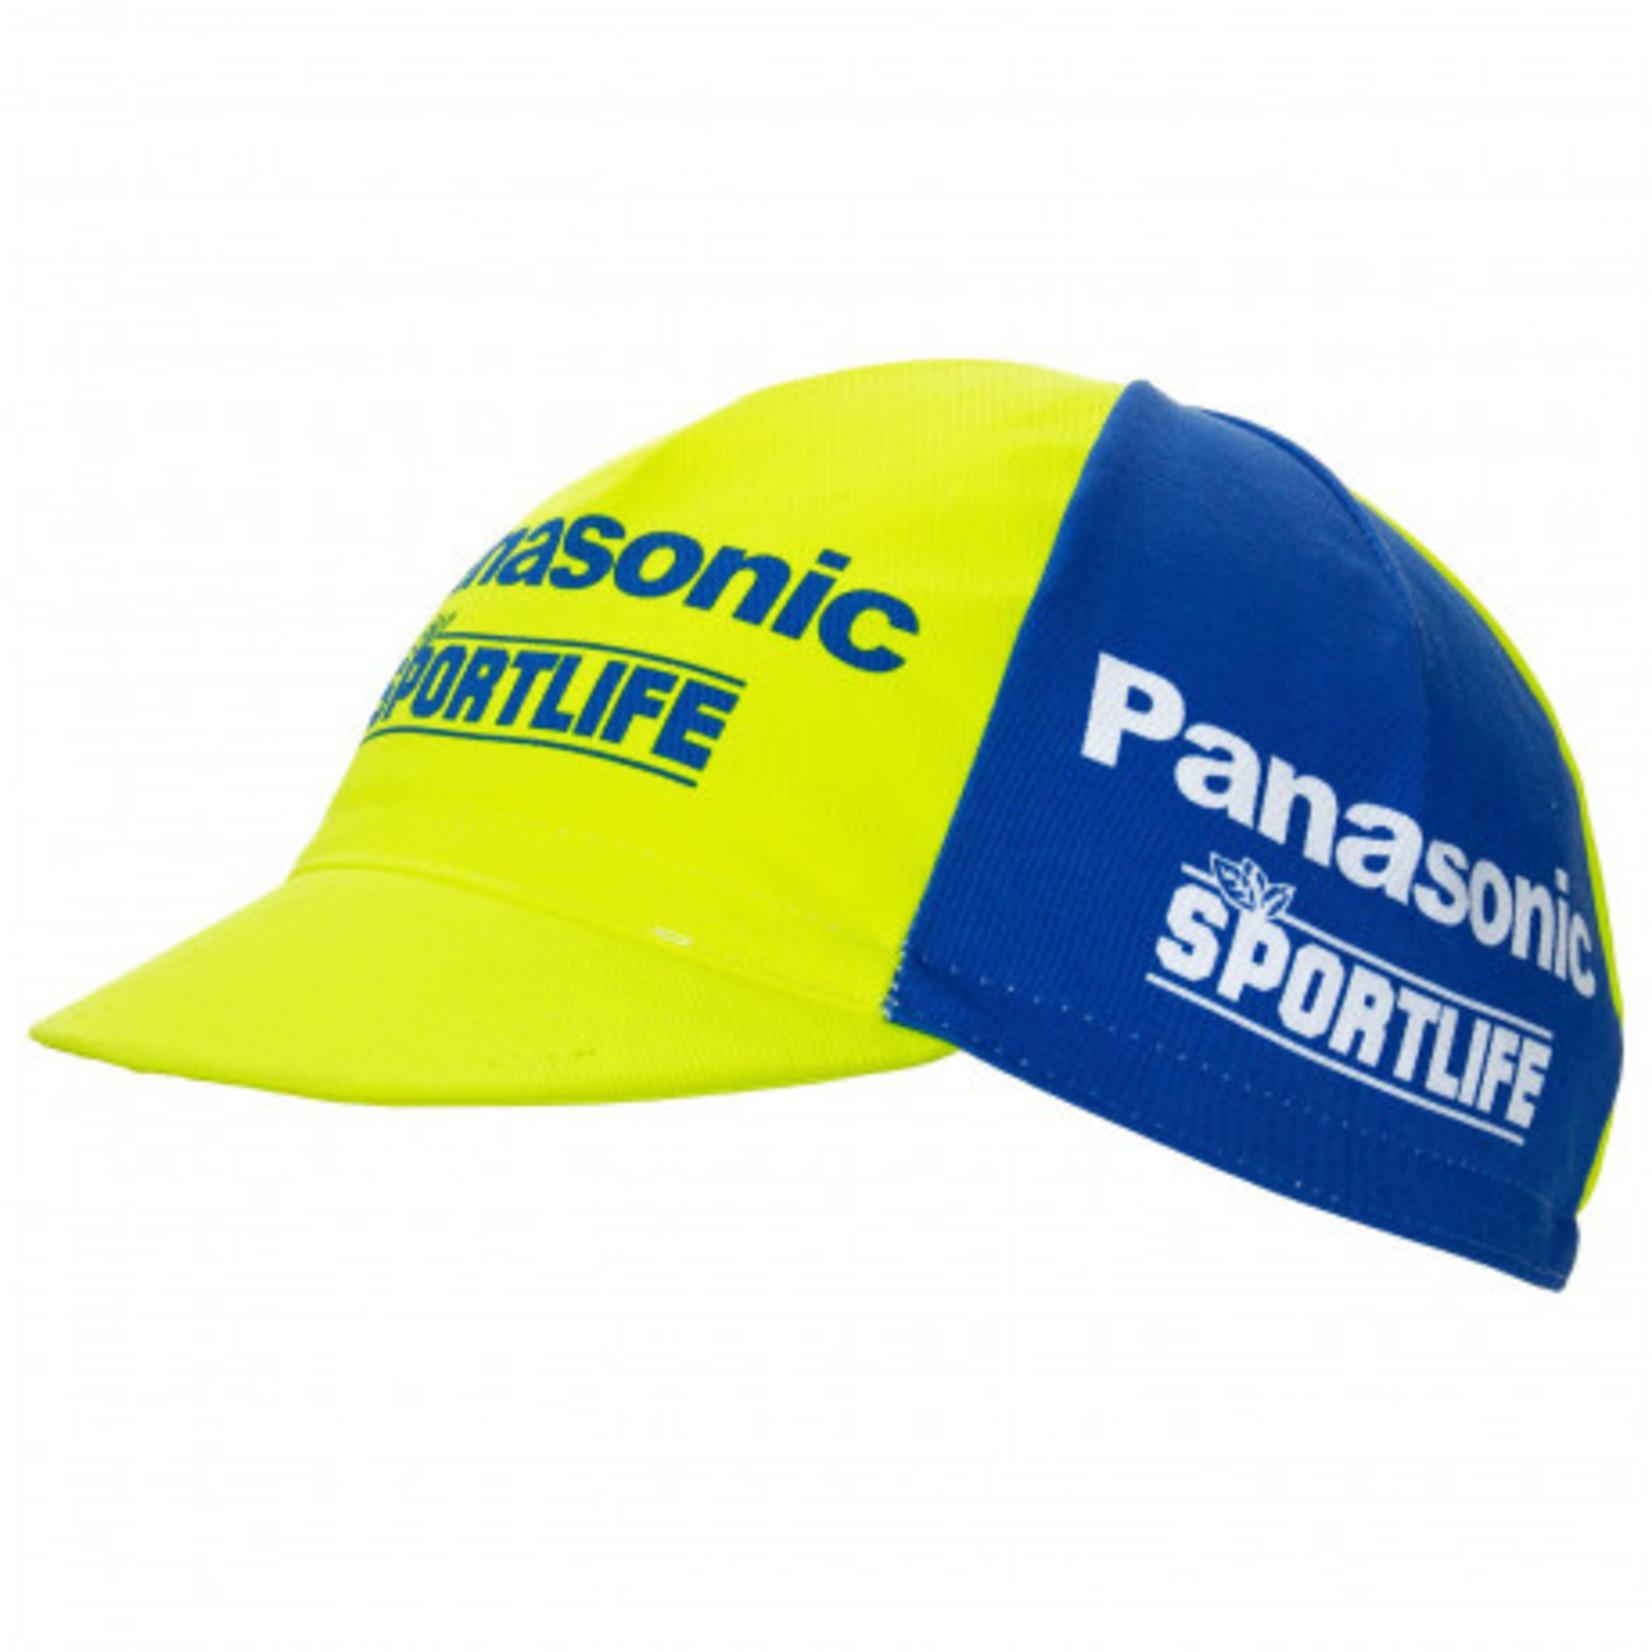 Retrocap Panasonic Sportlife